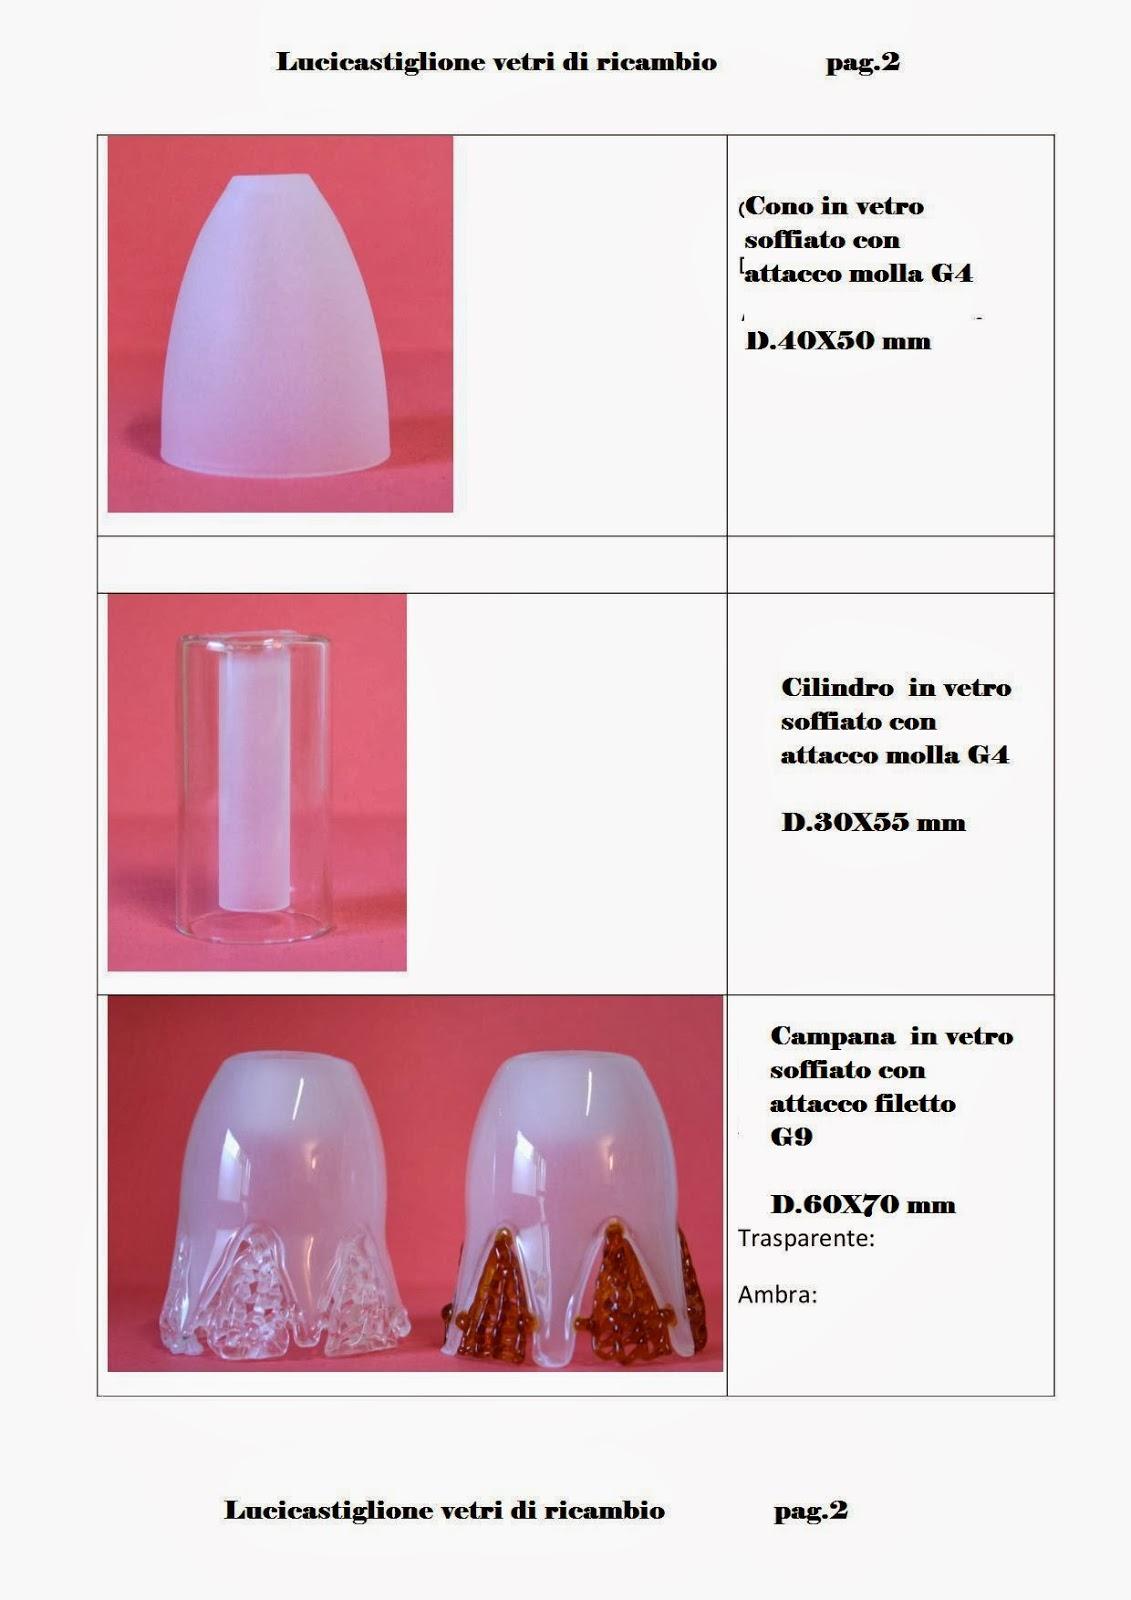 Ricambi per lampadari in vetro di Murano e Specchi  Catalogo ricambi in vetro per lampadari     -> Lampadari Moderni Fontana Arte